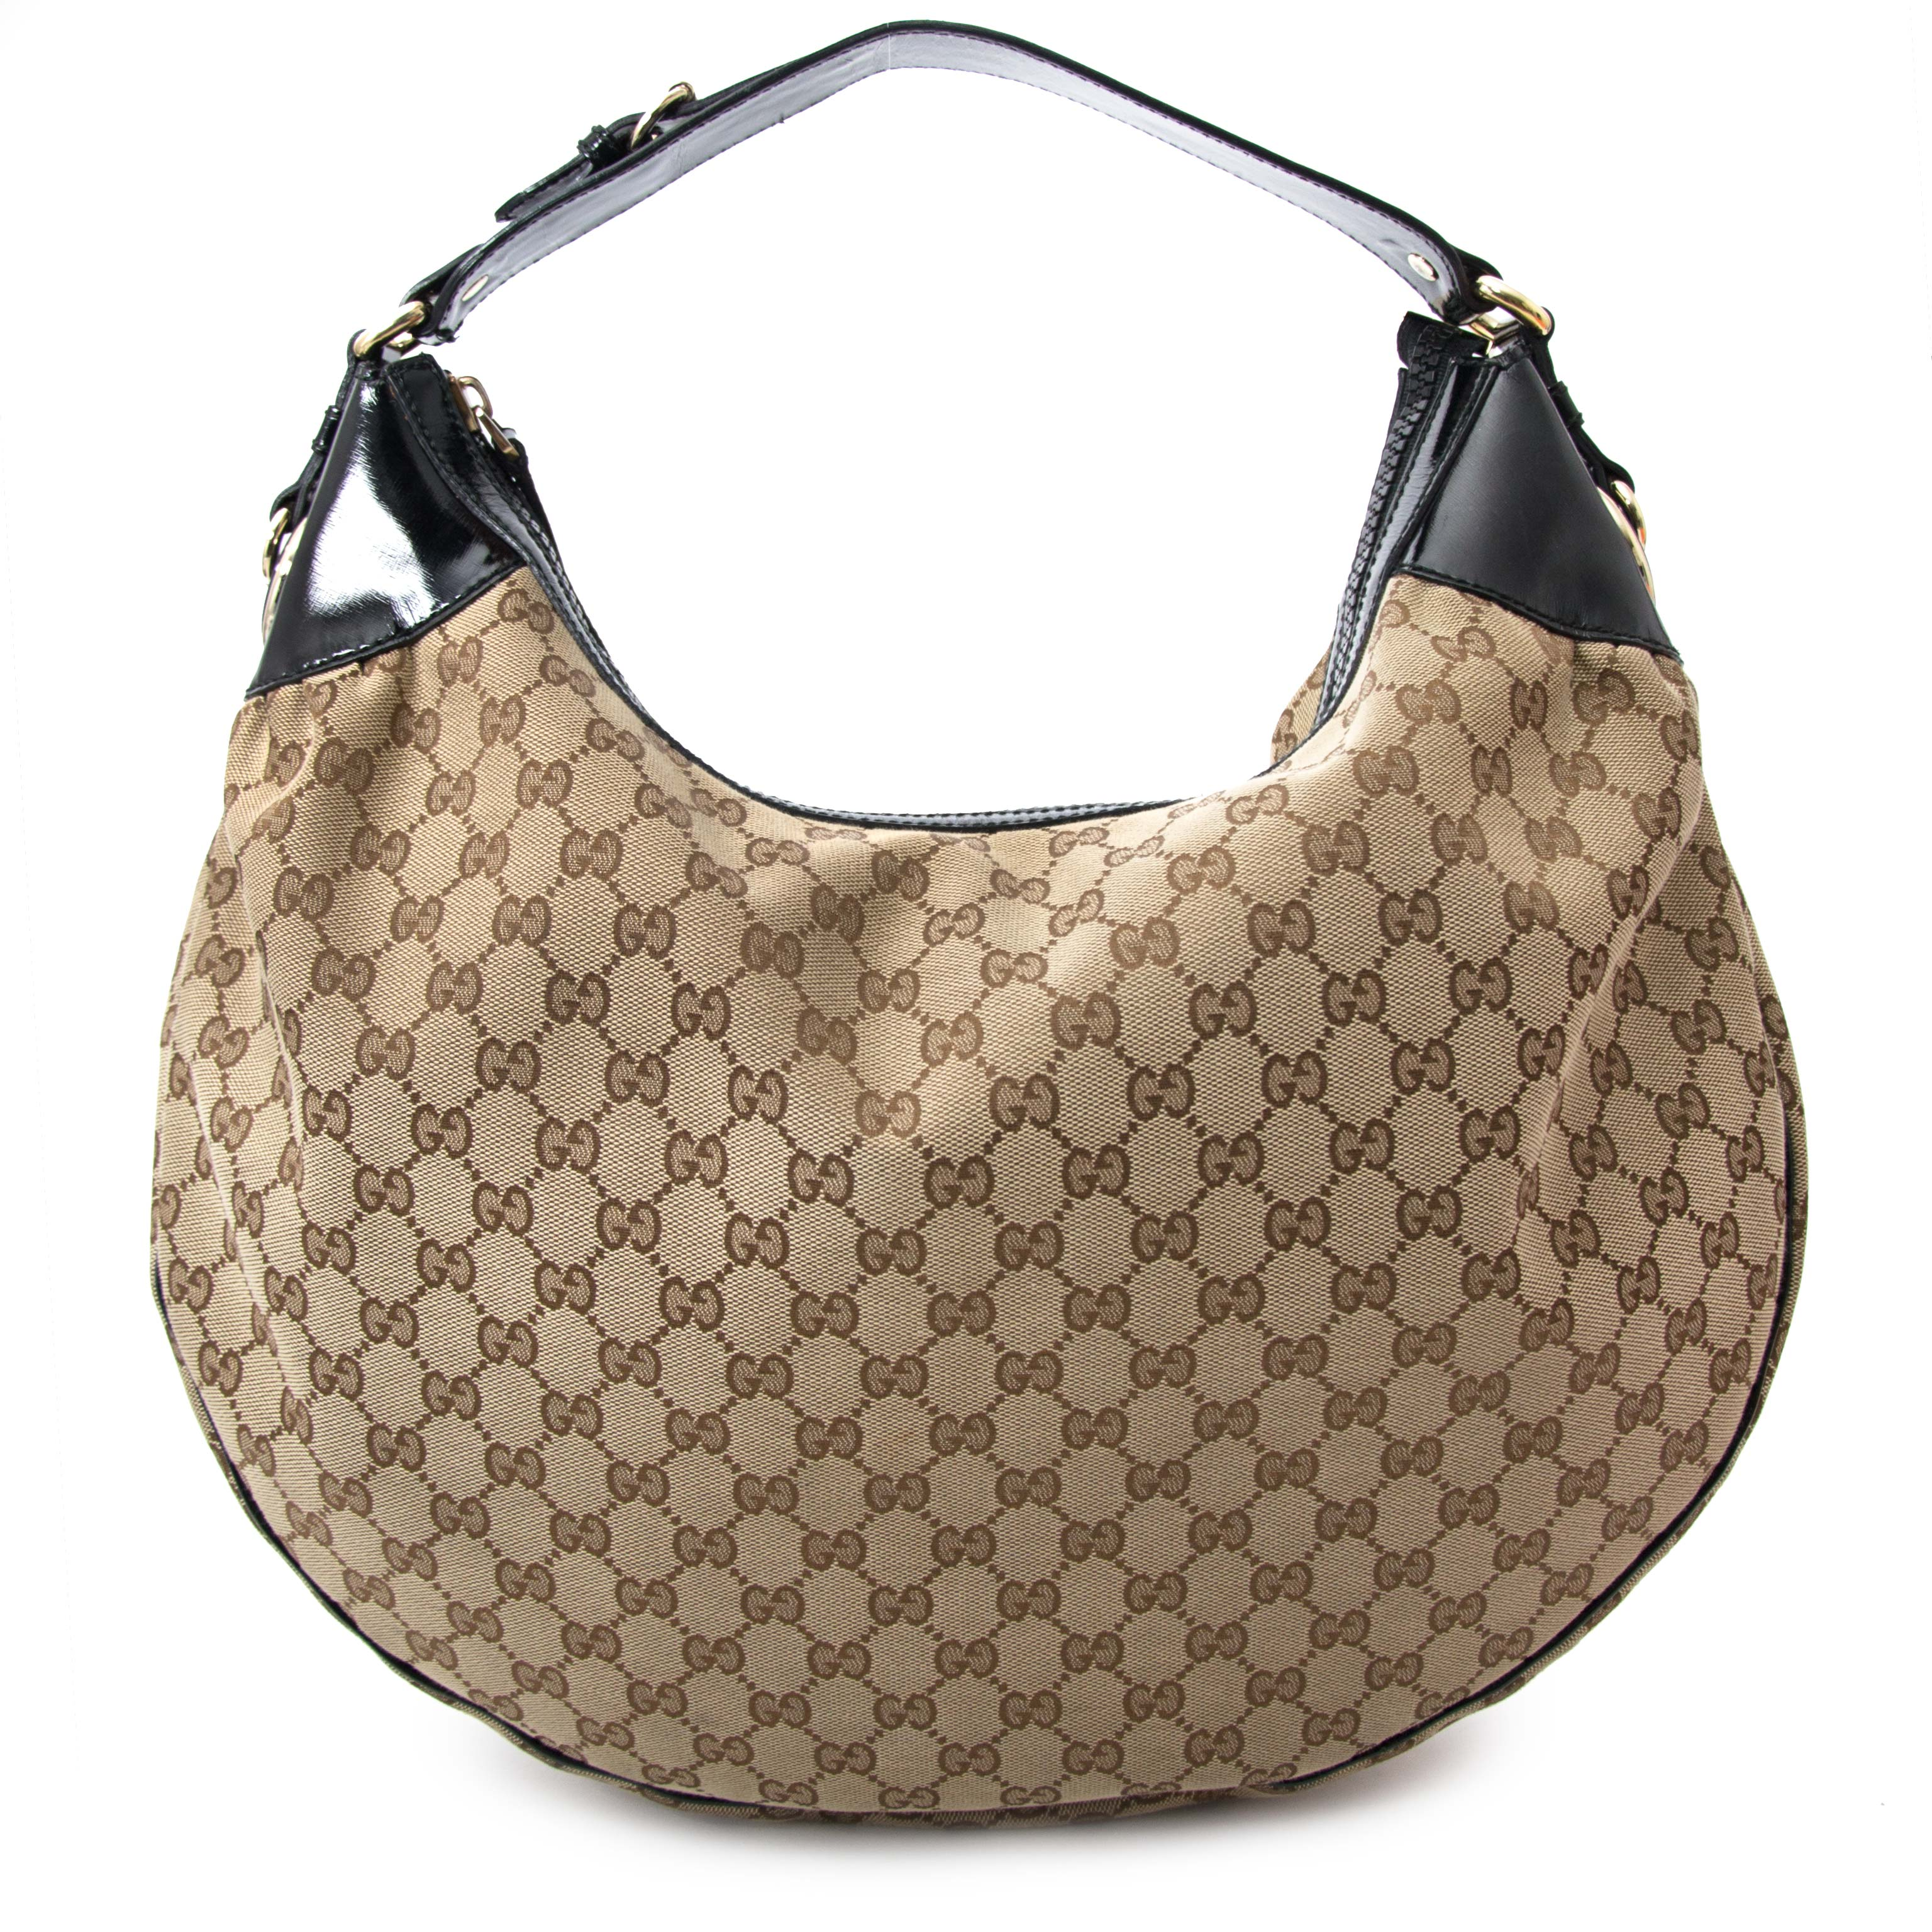 7ace20cd339 Labellov Buy authentic vintagePrada designer bags, shoes, clothes ...